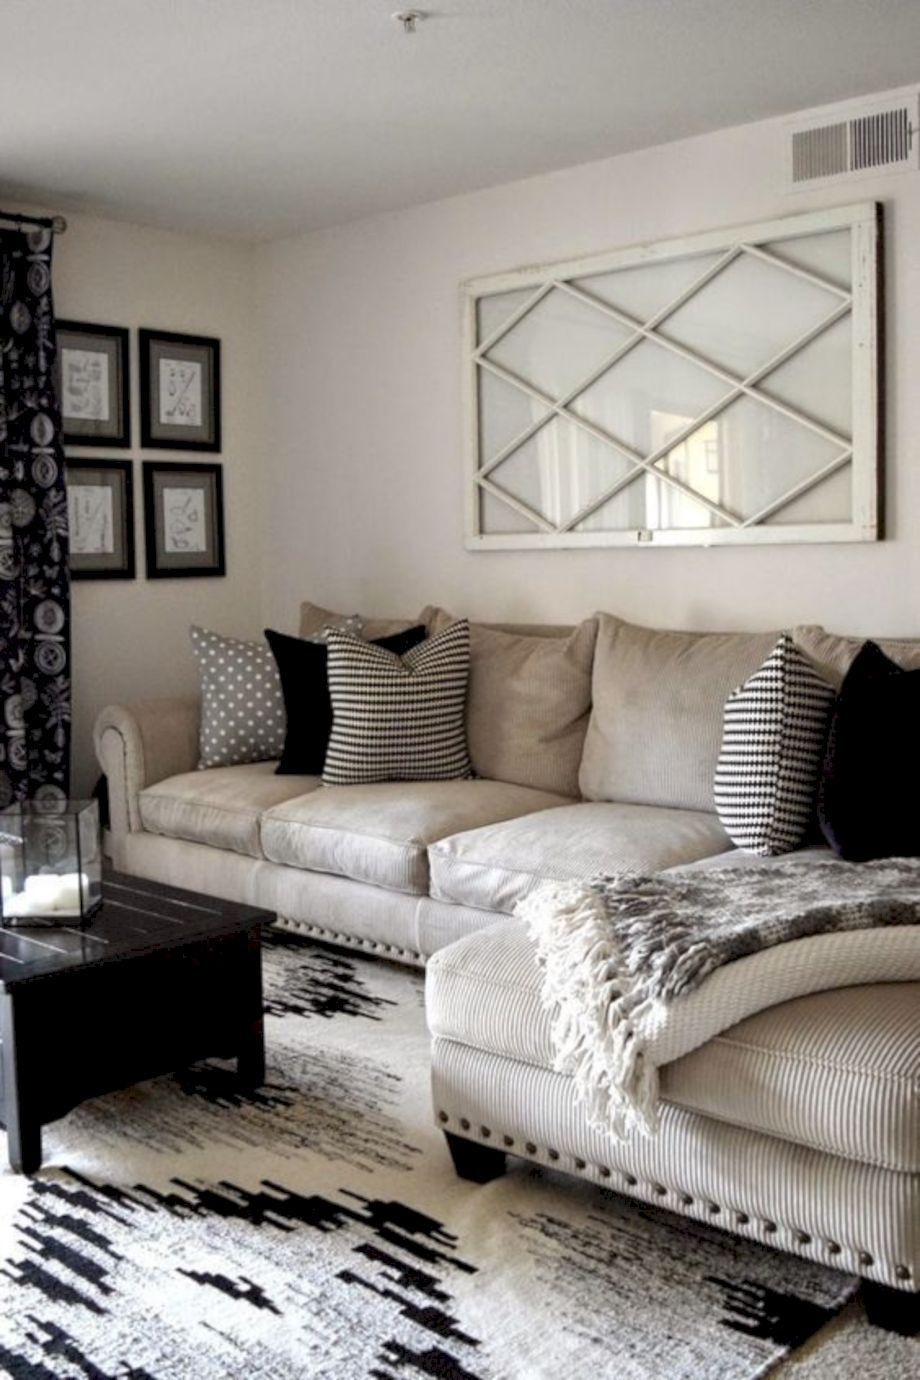 Stunning 63 Impressive DIY Home Decor Ideas on A Budget https://cooarchitecture.com/2017/07/26/63-impressive-diy-home-decor-ideas-budget/